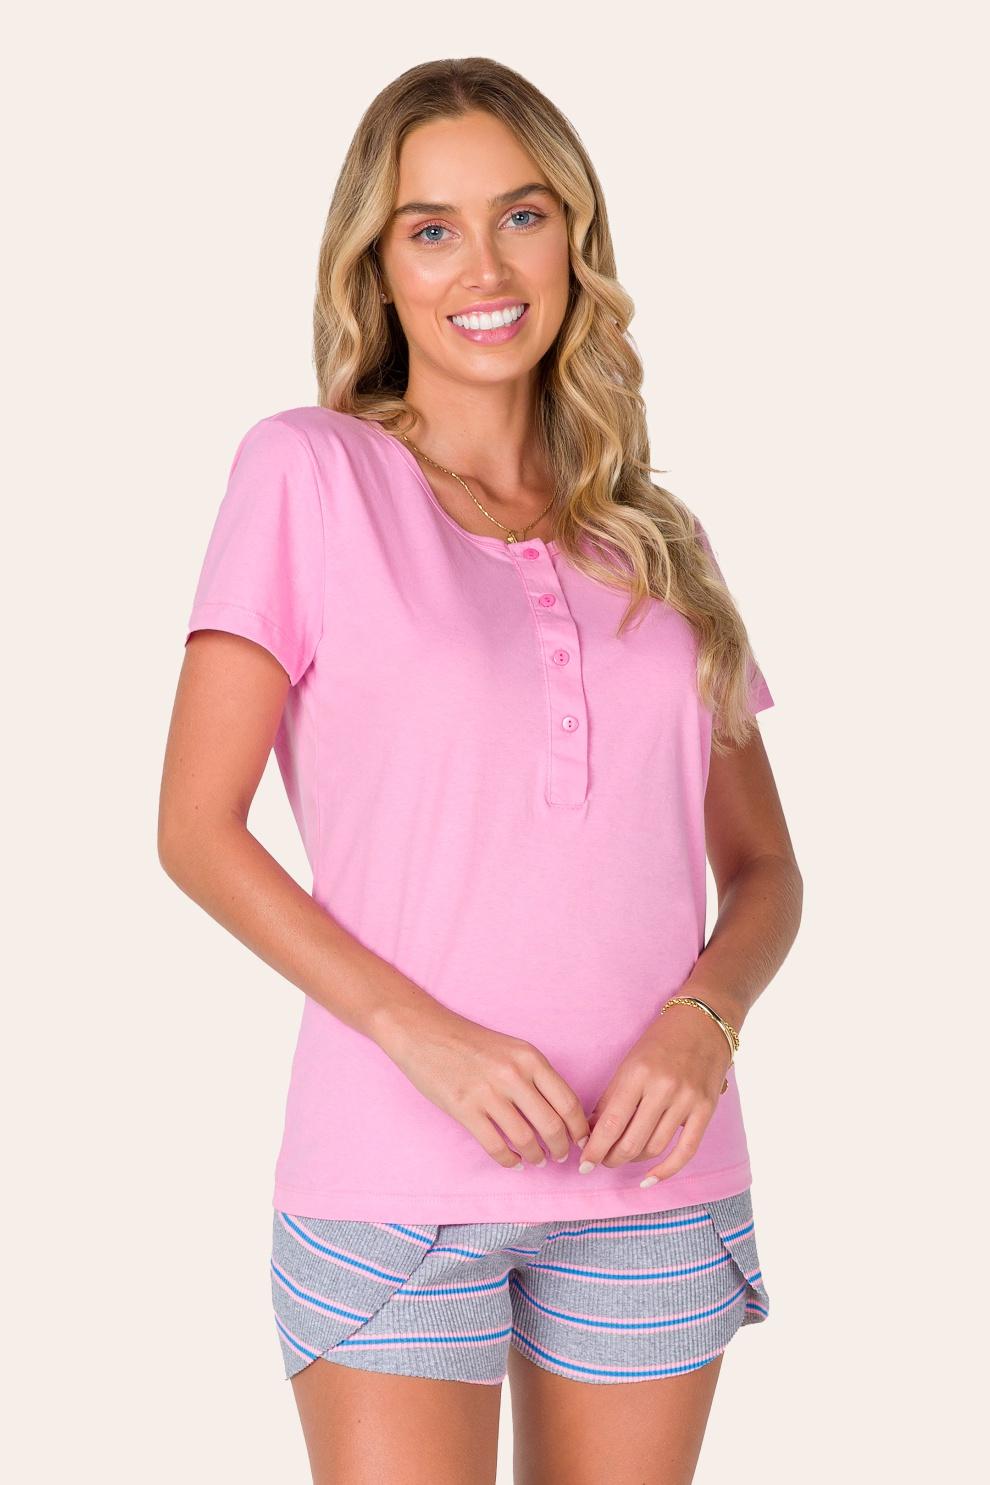 021/C - Pijama Adulto Feminino Aberto Rosa